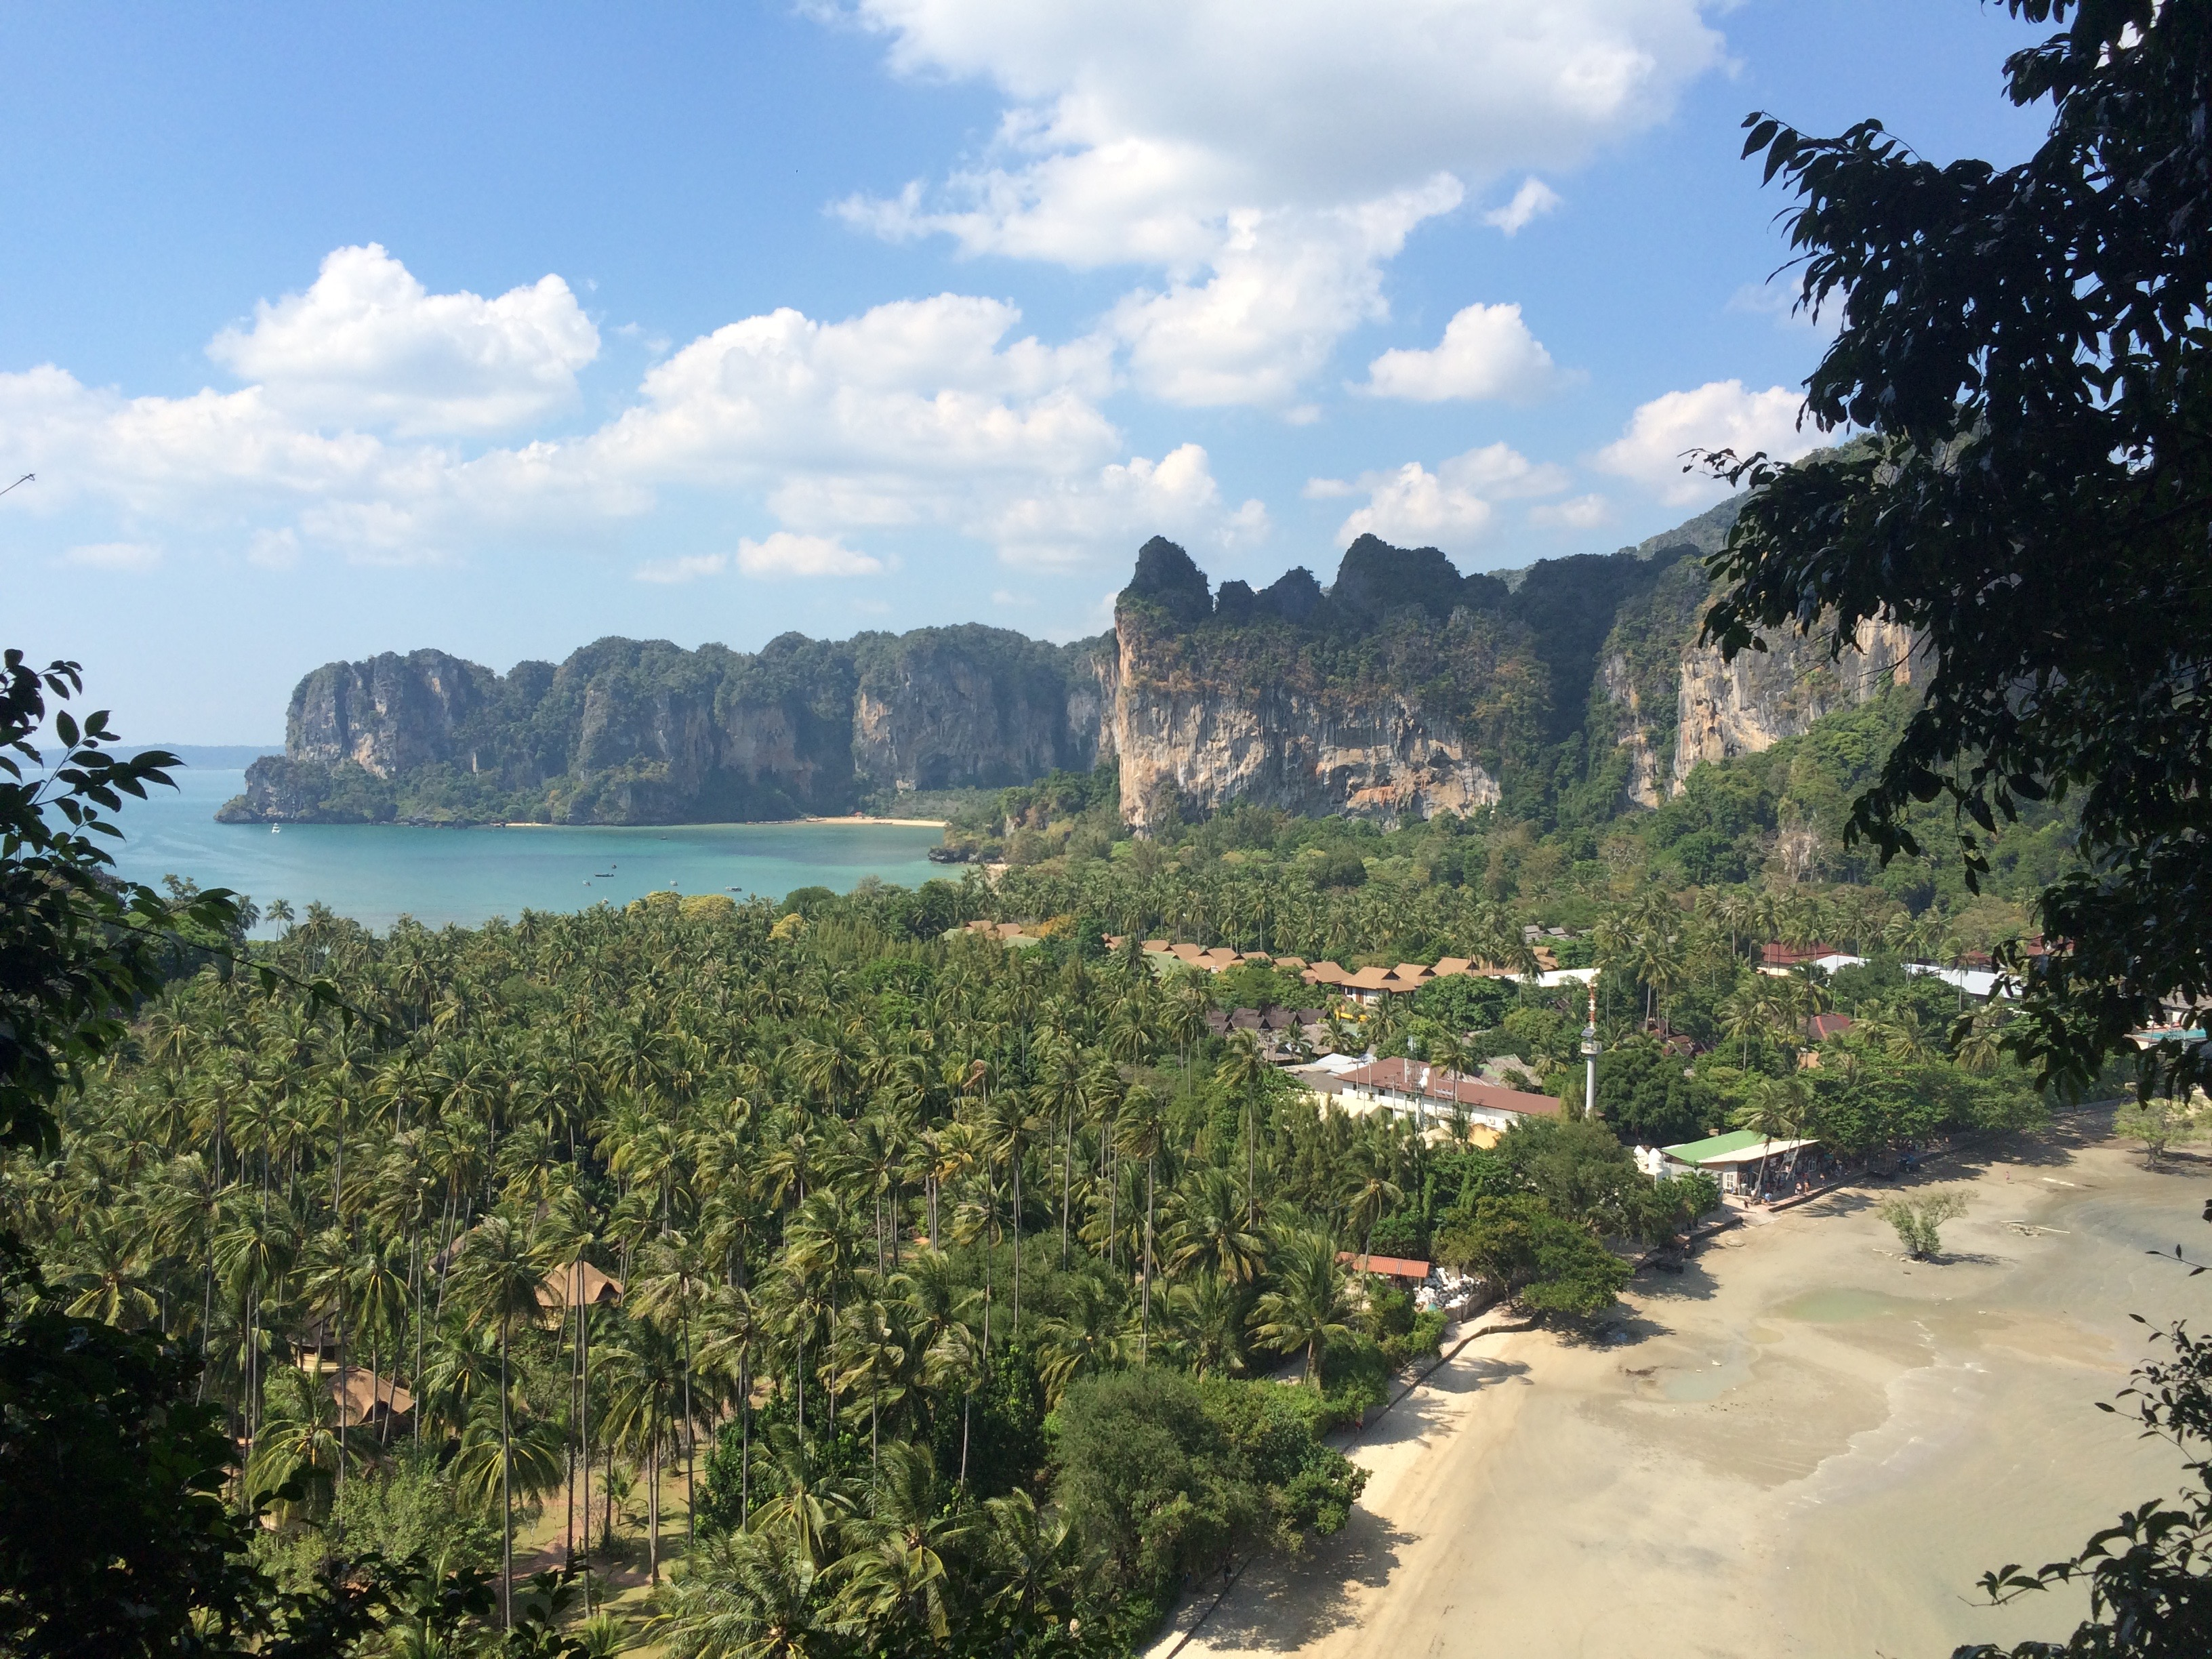 Vista do Viewpoint de Phra Nang. A praia da direita é Railay East, que serve de píer. (Foto: Nathalia Tavolieri)